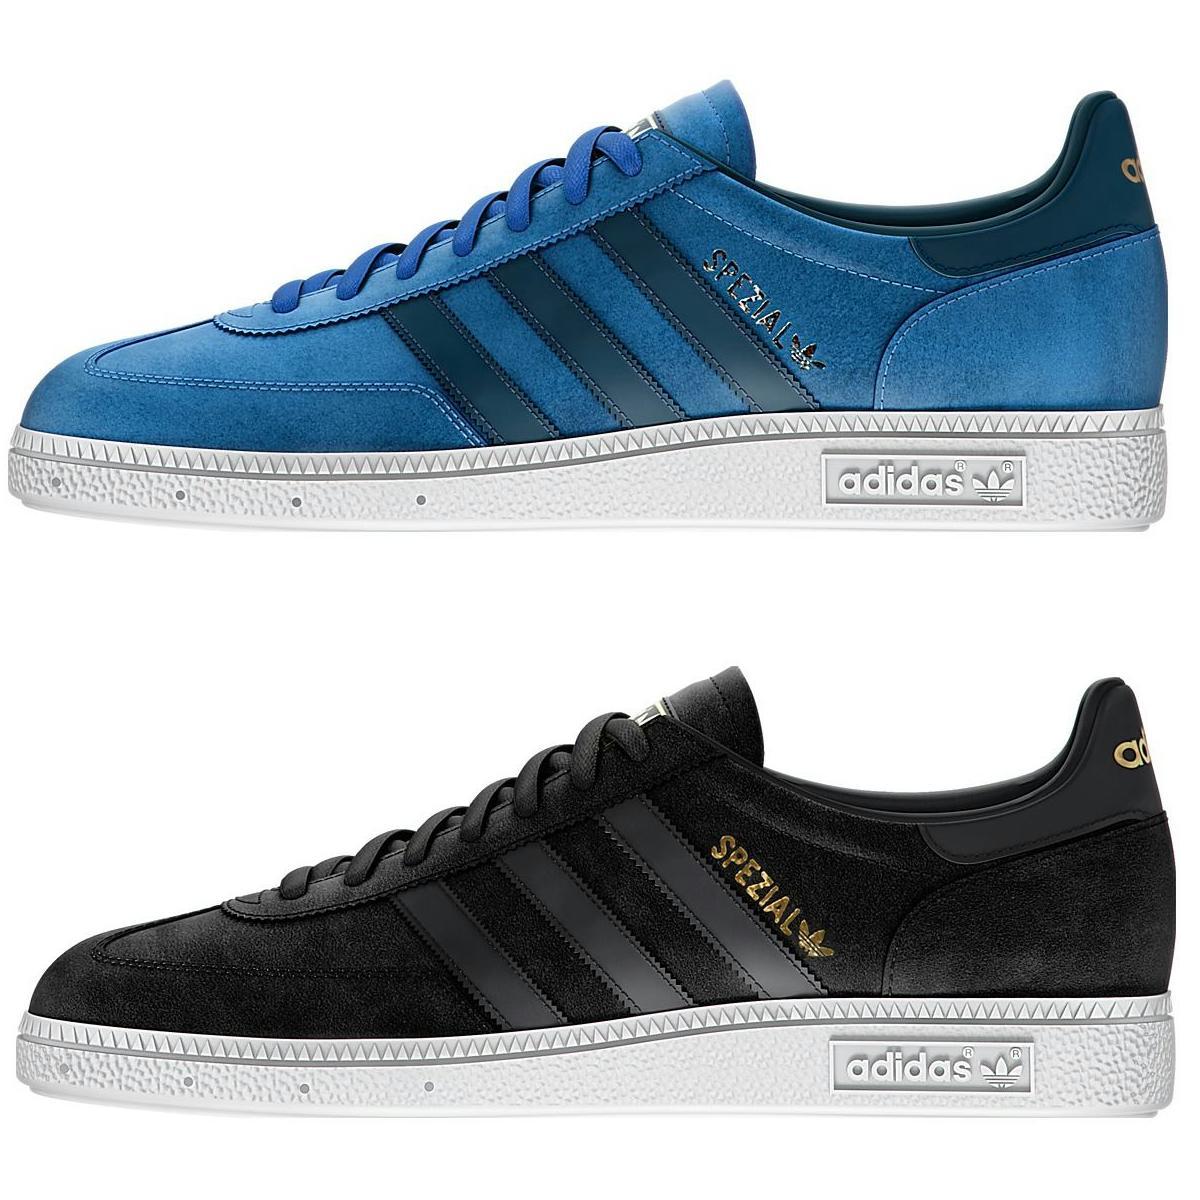 adidas originals spezial herren schuhe sneakers turnschuhe schwarz blau ebay. Black Bedroom Furniture Sets. Home Design Ideas